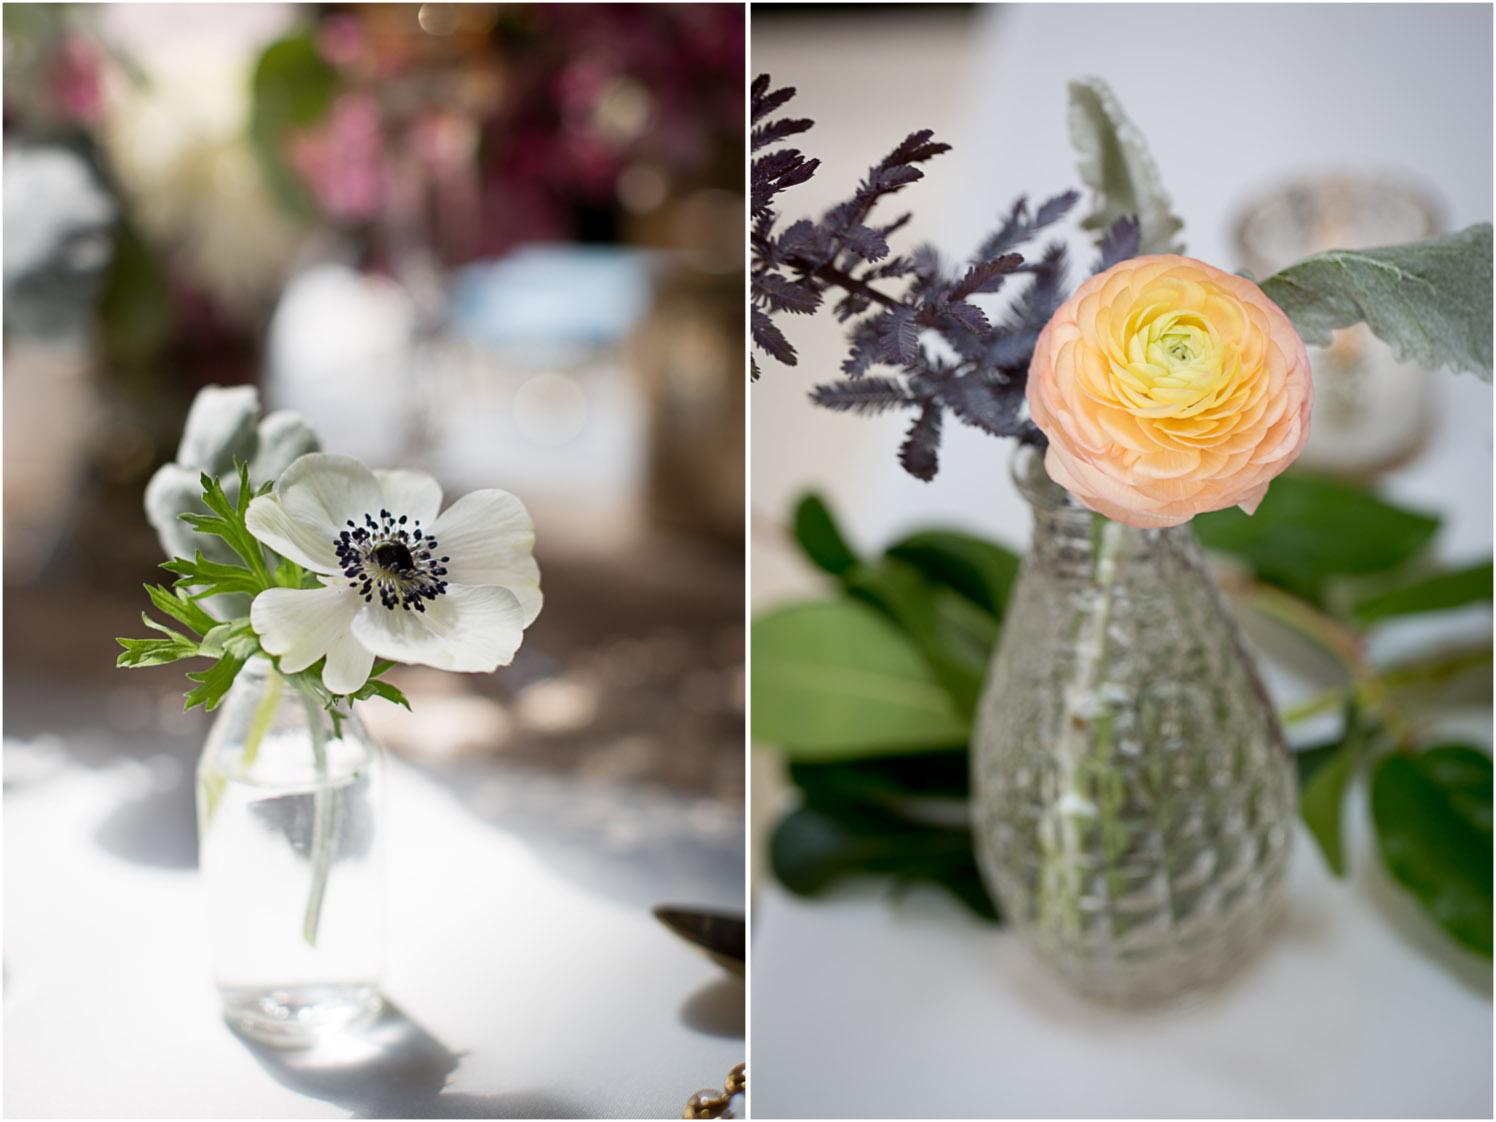 04-double-tree-by-hilton-park-place-weddings-st-louis-park-minneapolis-minnesota-wedding-photographer-styled-shoot-small-floral-details-single-bud-vases-mahonen-photography.jpg